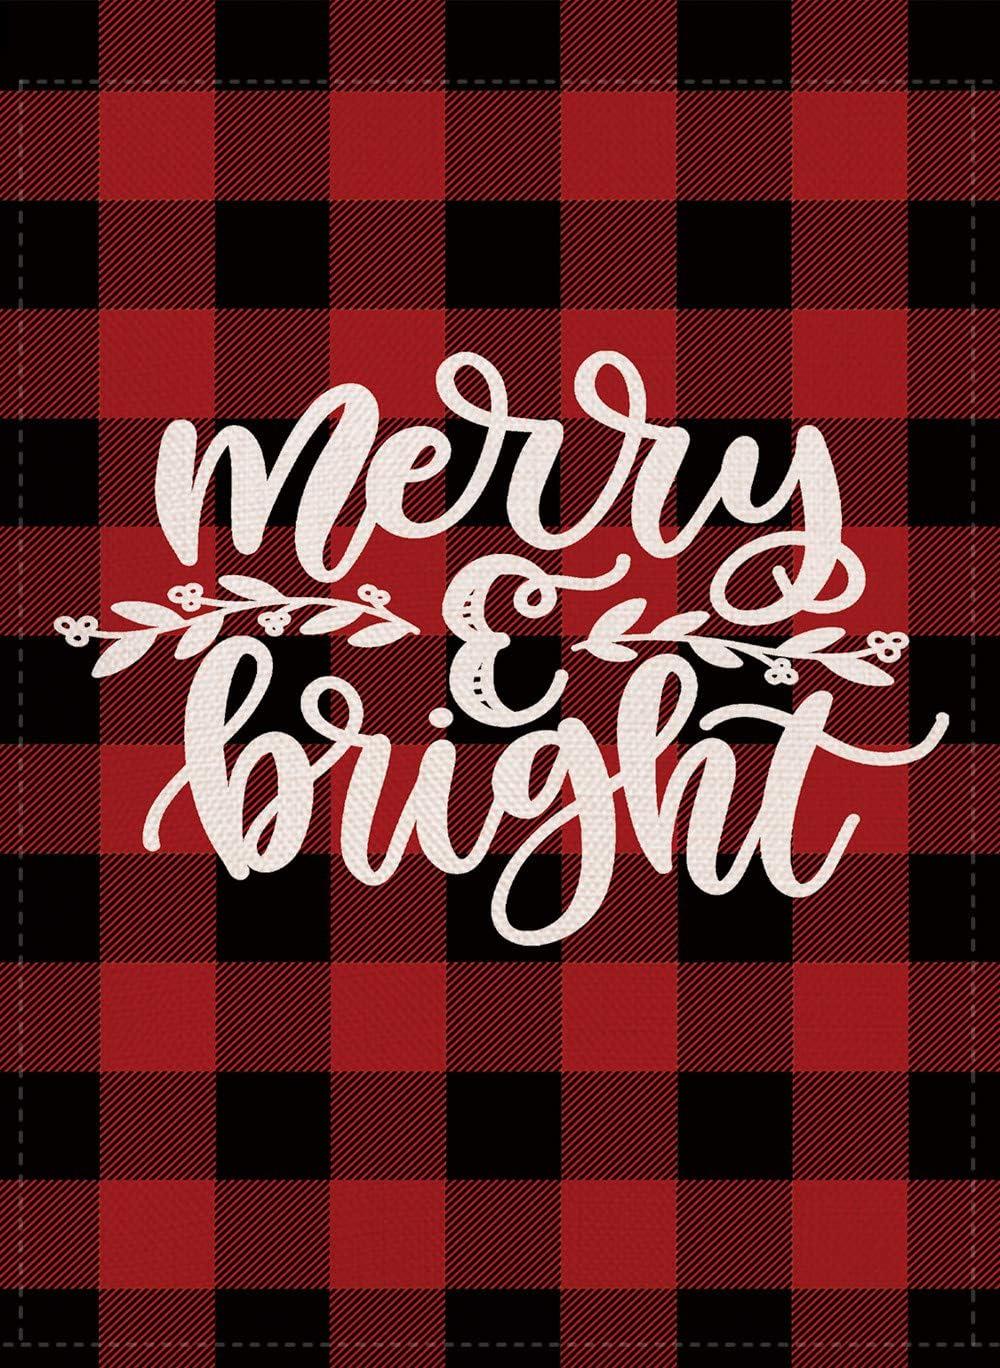 Furiaz Merry & Bright Decorative Christmas Garden Flag, Buffalo Check Plaid Xmas Outdoor Flag Sign Red Black, Rustic Burlap House Yard Flag Winter Outside Decoration Holiday Home Decor Flag 12 x 18